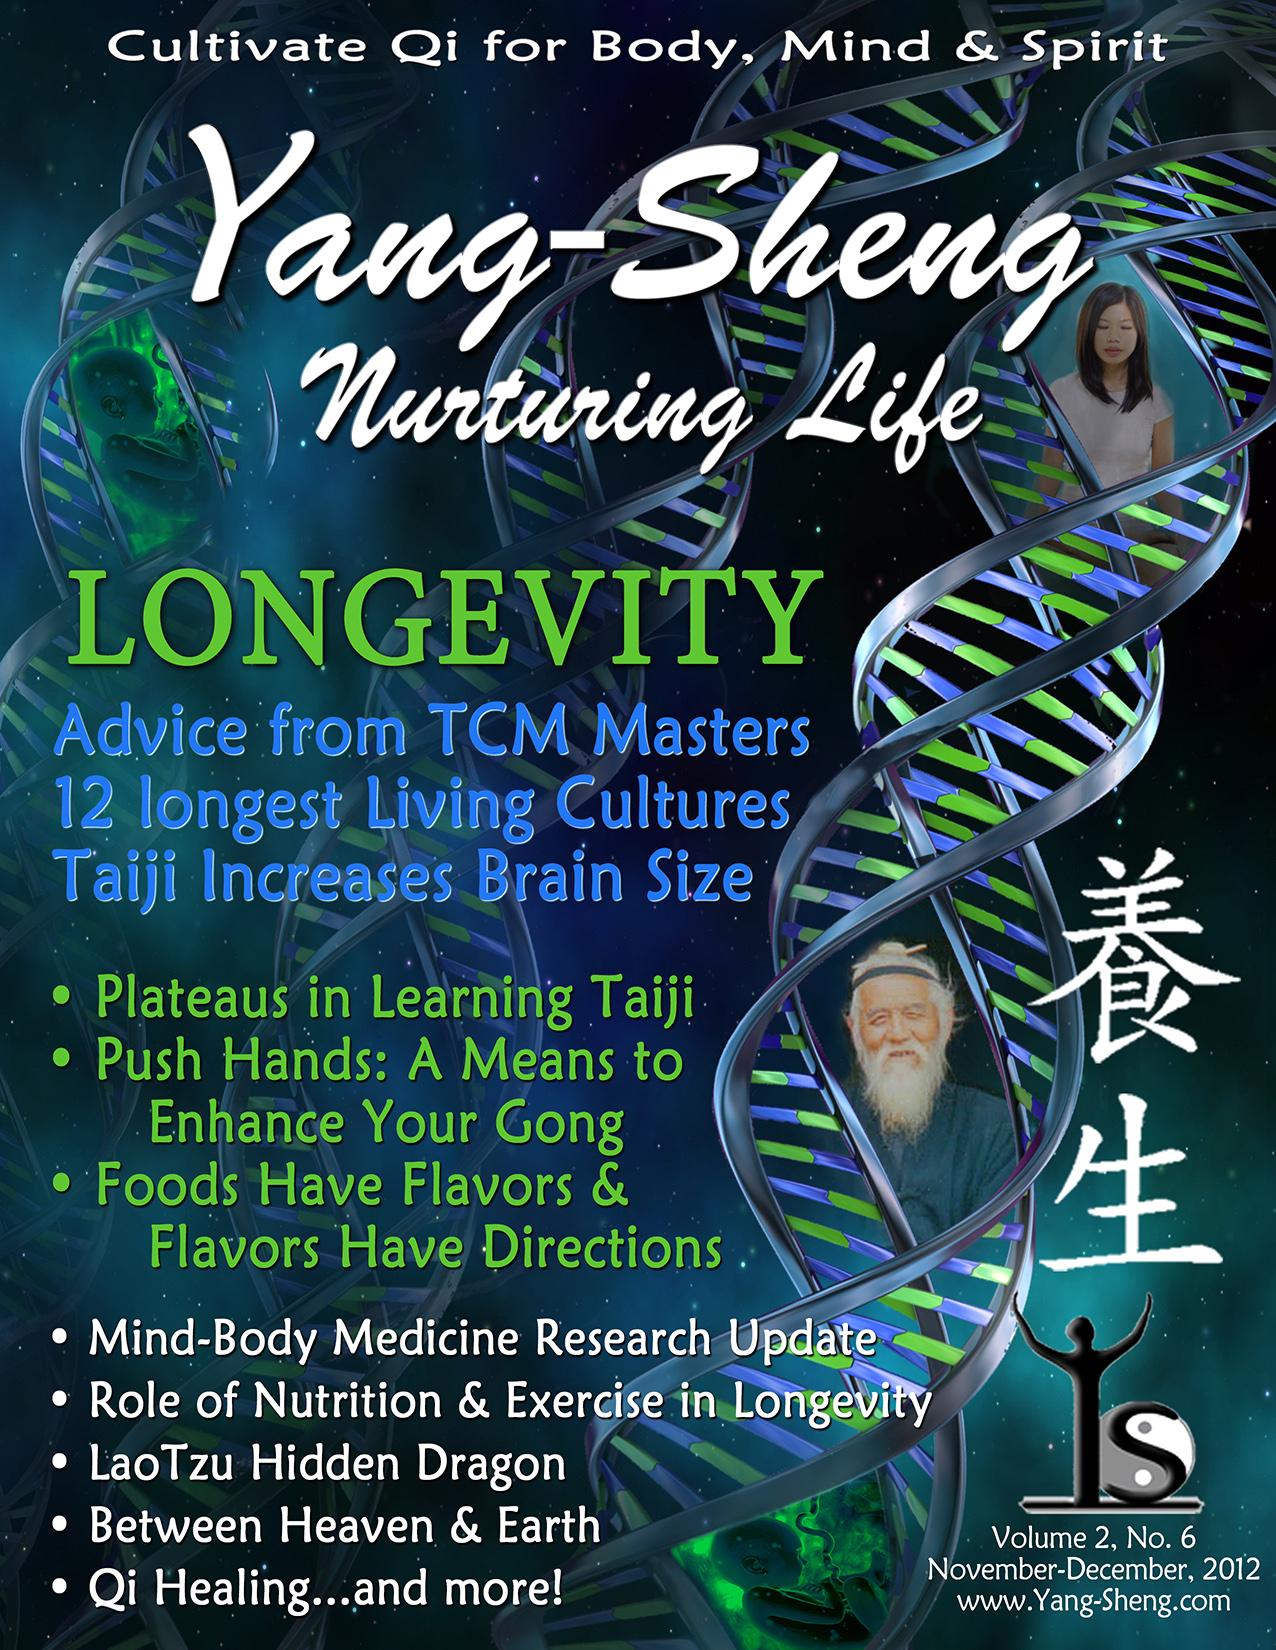 Yang-Sheng-Nov-Dec-2012-cover-print-150dpi